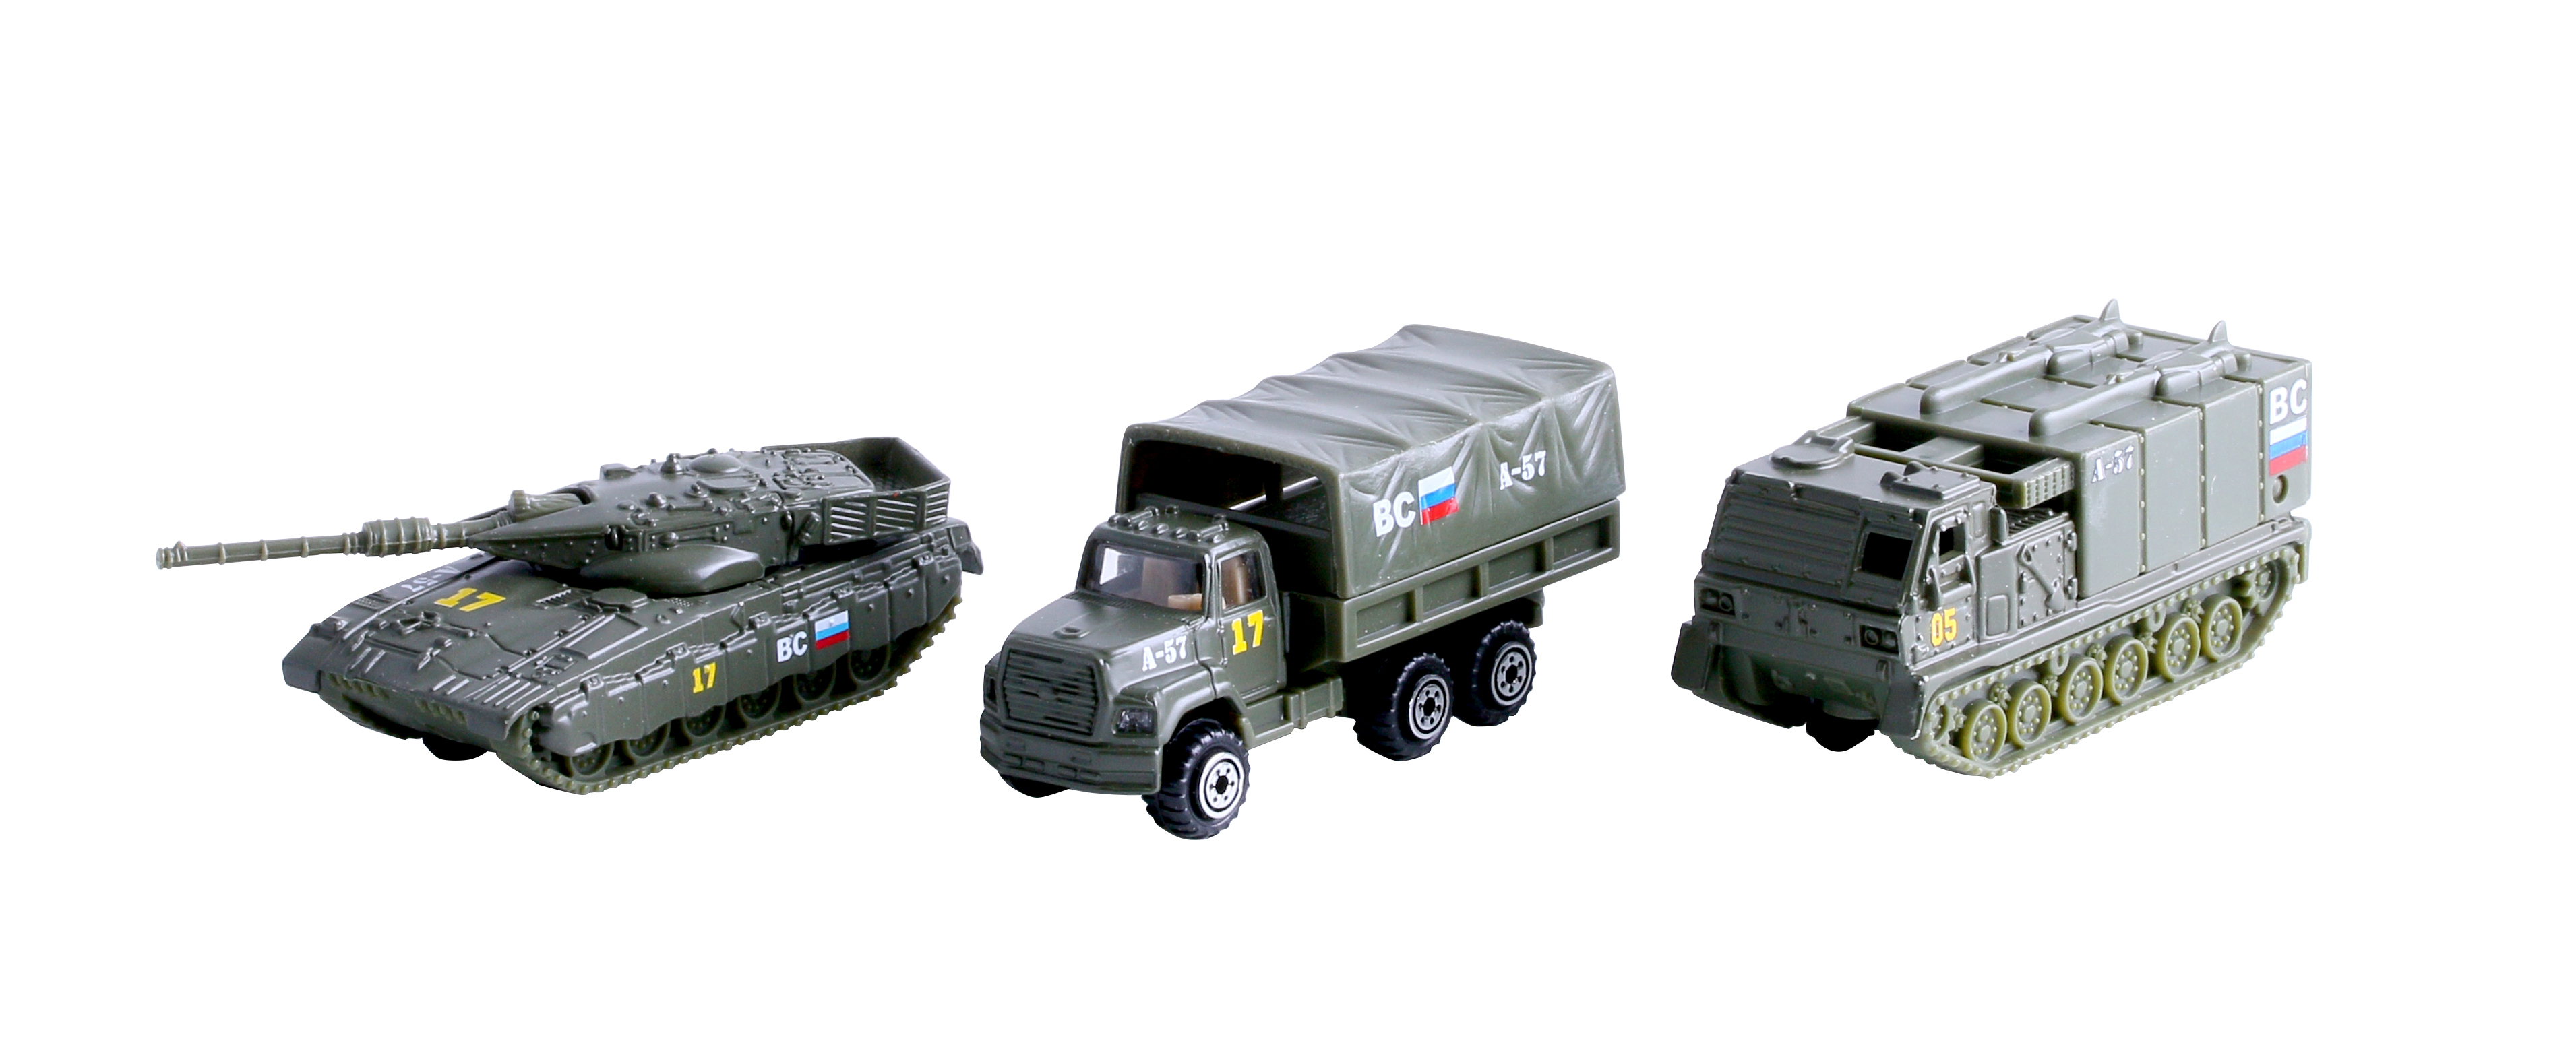 Танки и военная техника WinCars Военная техника 1:100 танки и военная техника wincars набор машинок wincars автоперевозчик военная техника 1 70 в асс